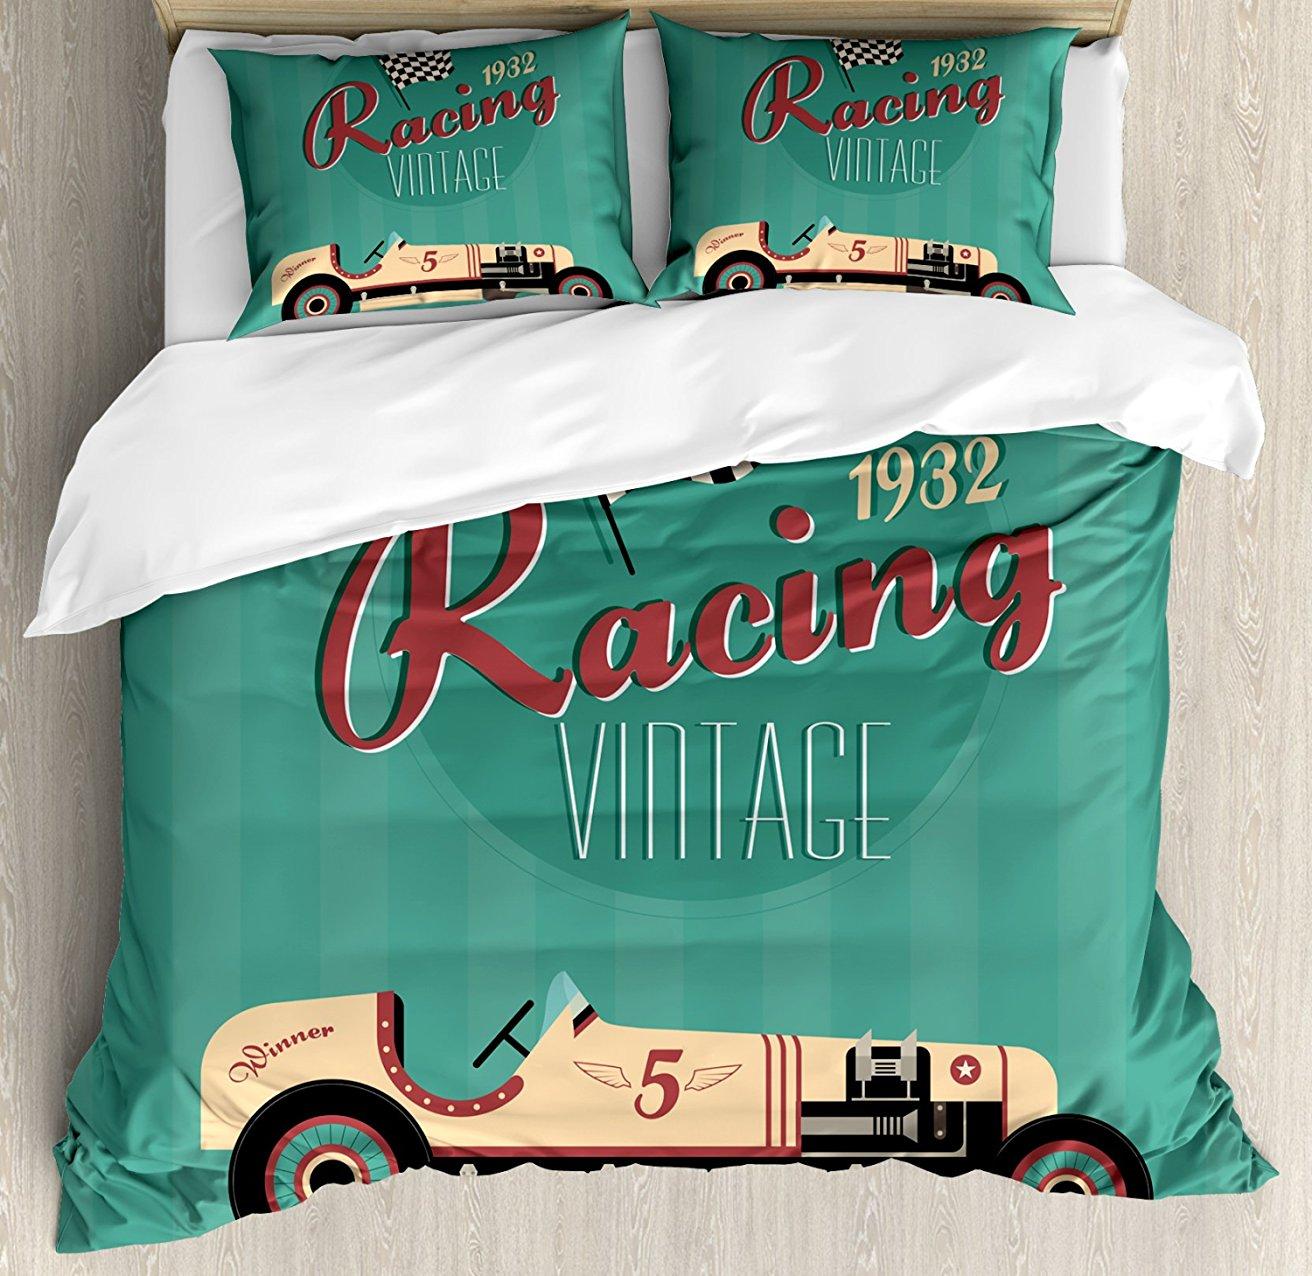 Duvet Cover Set , Poster Print of a Classic Vintage Automobile Nostalgia Rally Antique Machine, 4 Piece Bedding Set